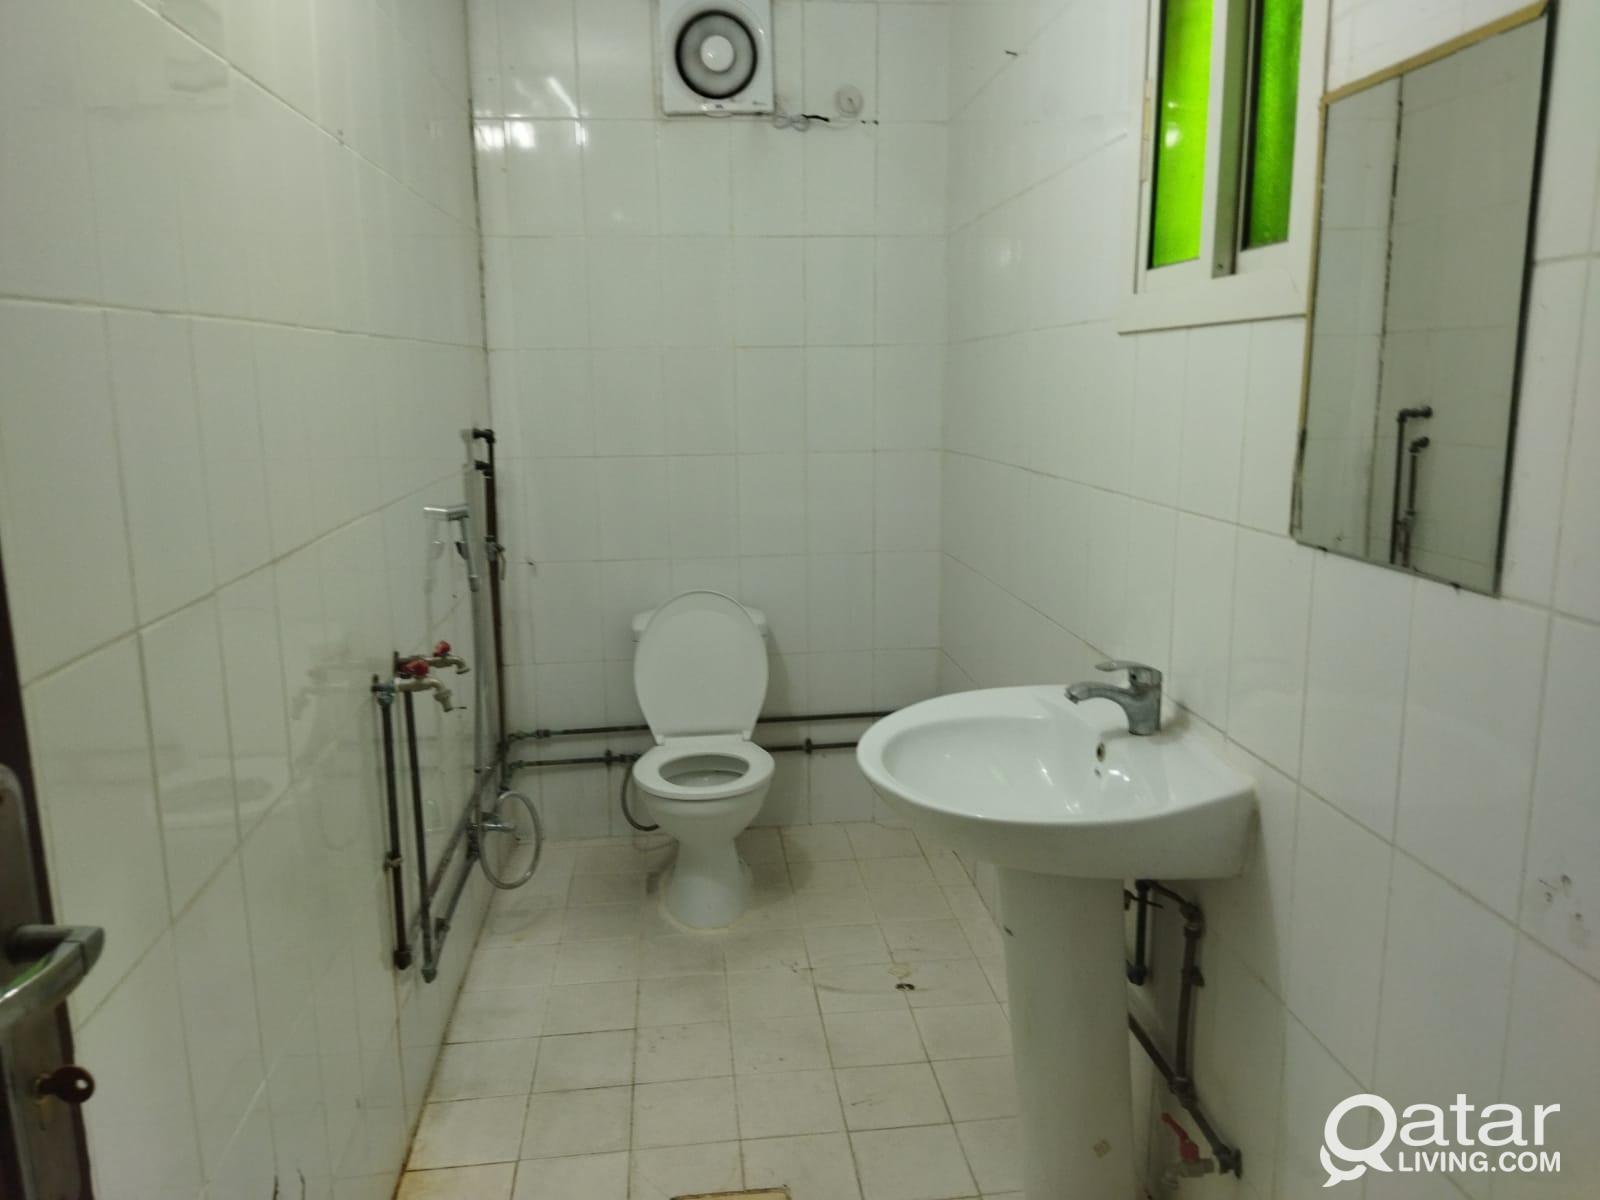 Hot Offer - Spacious 2 BHK Apartment For Rent @Naj